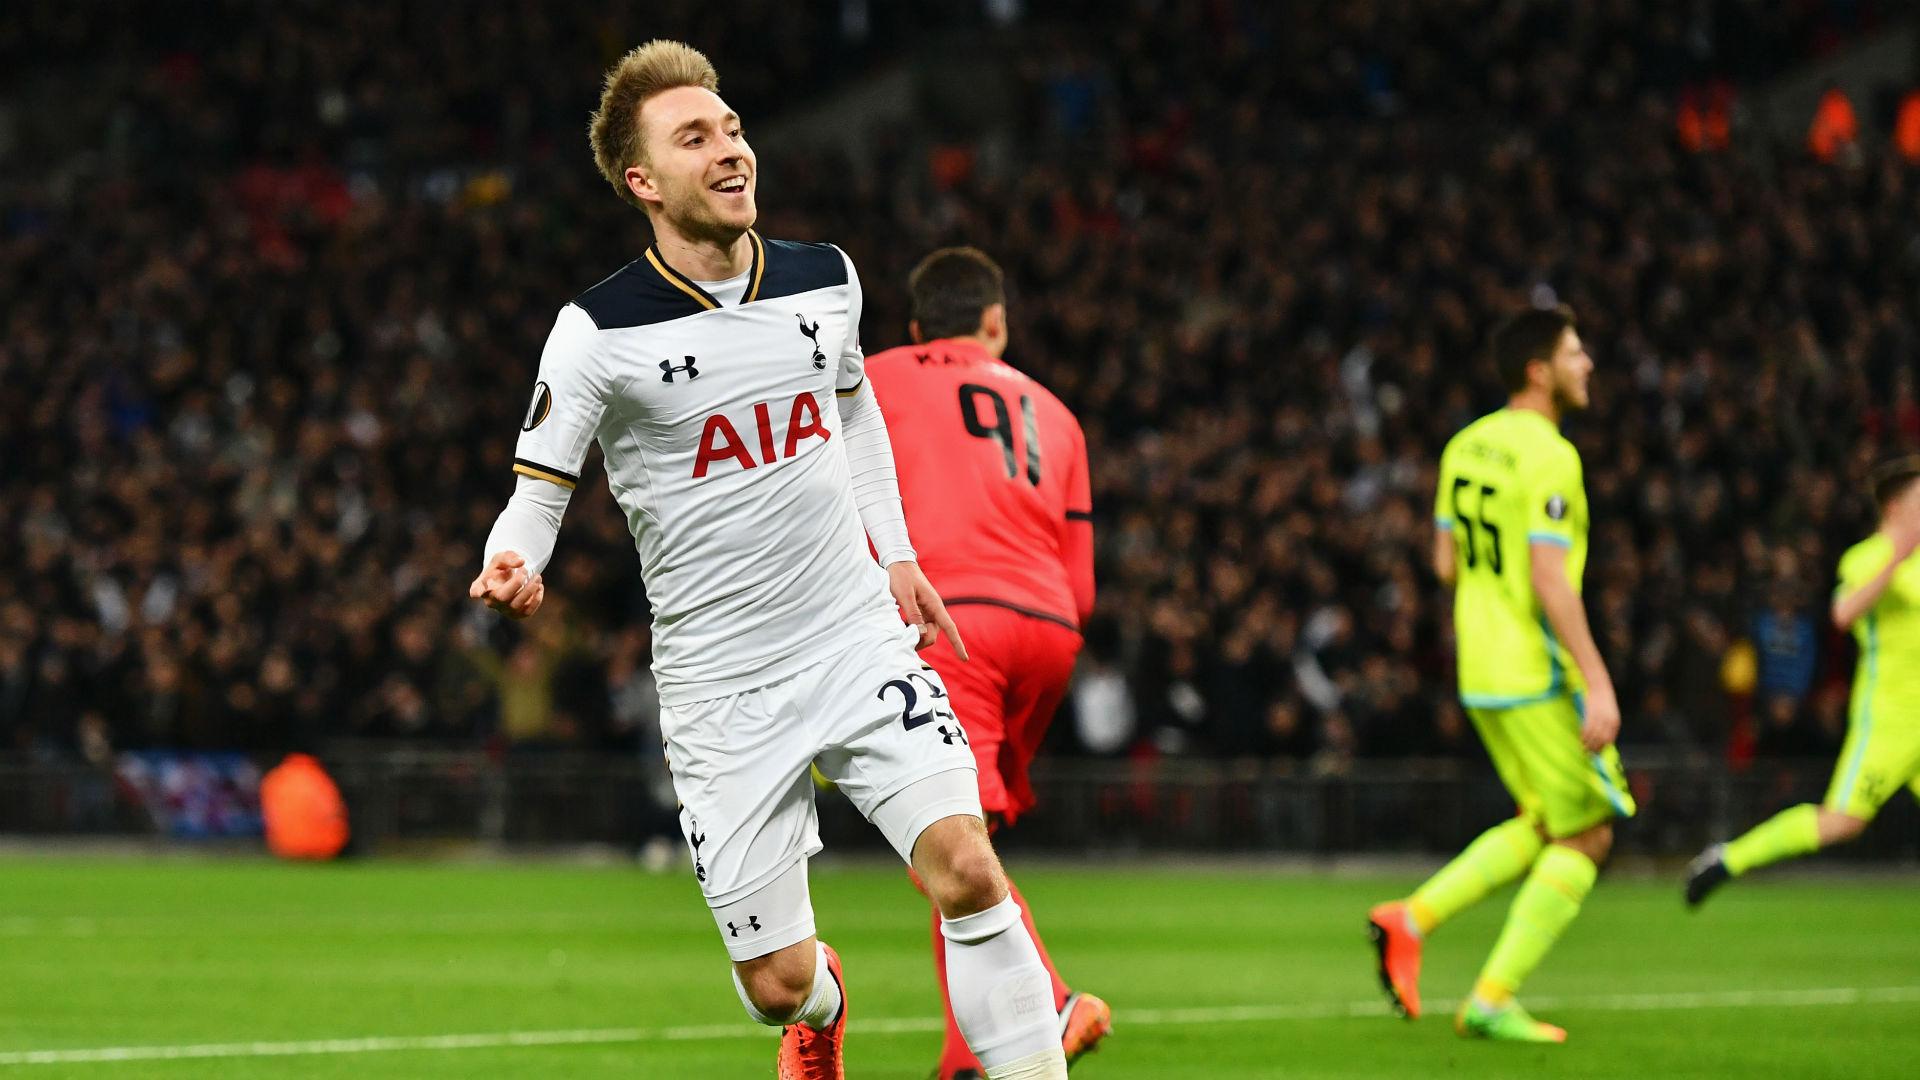 Tottenham Gent Christian Eriksen